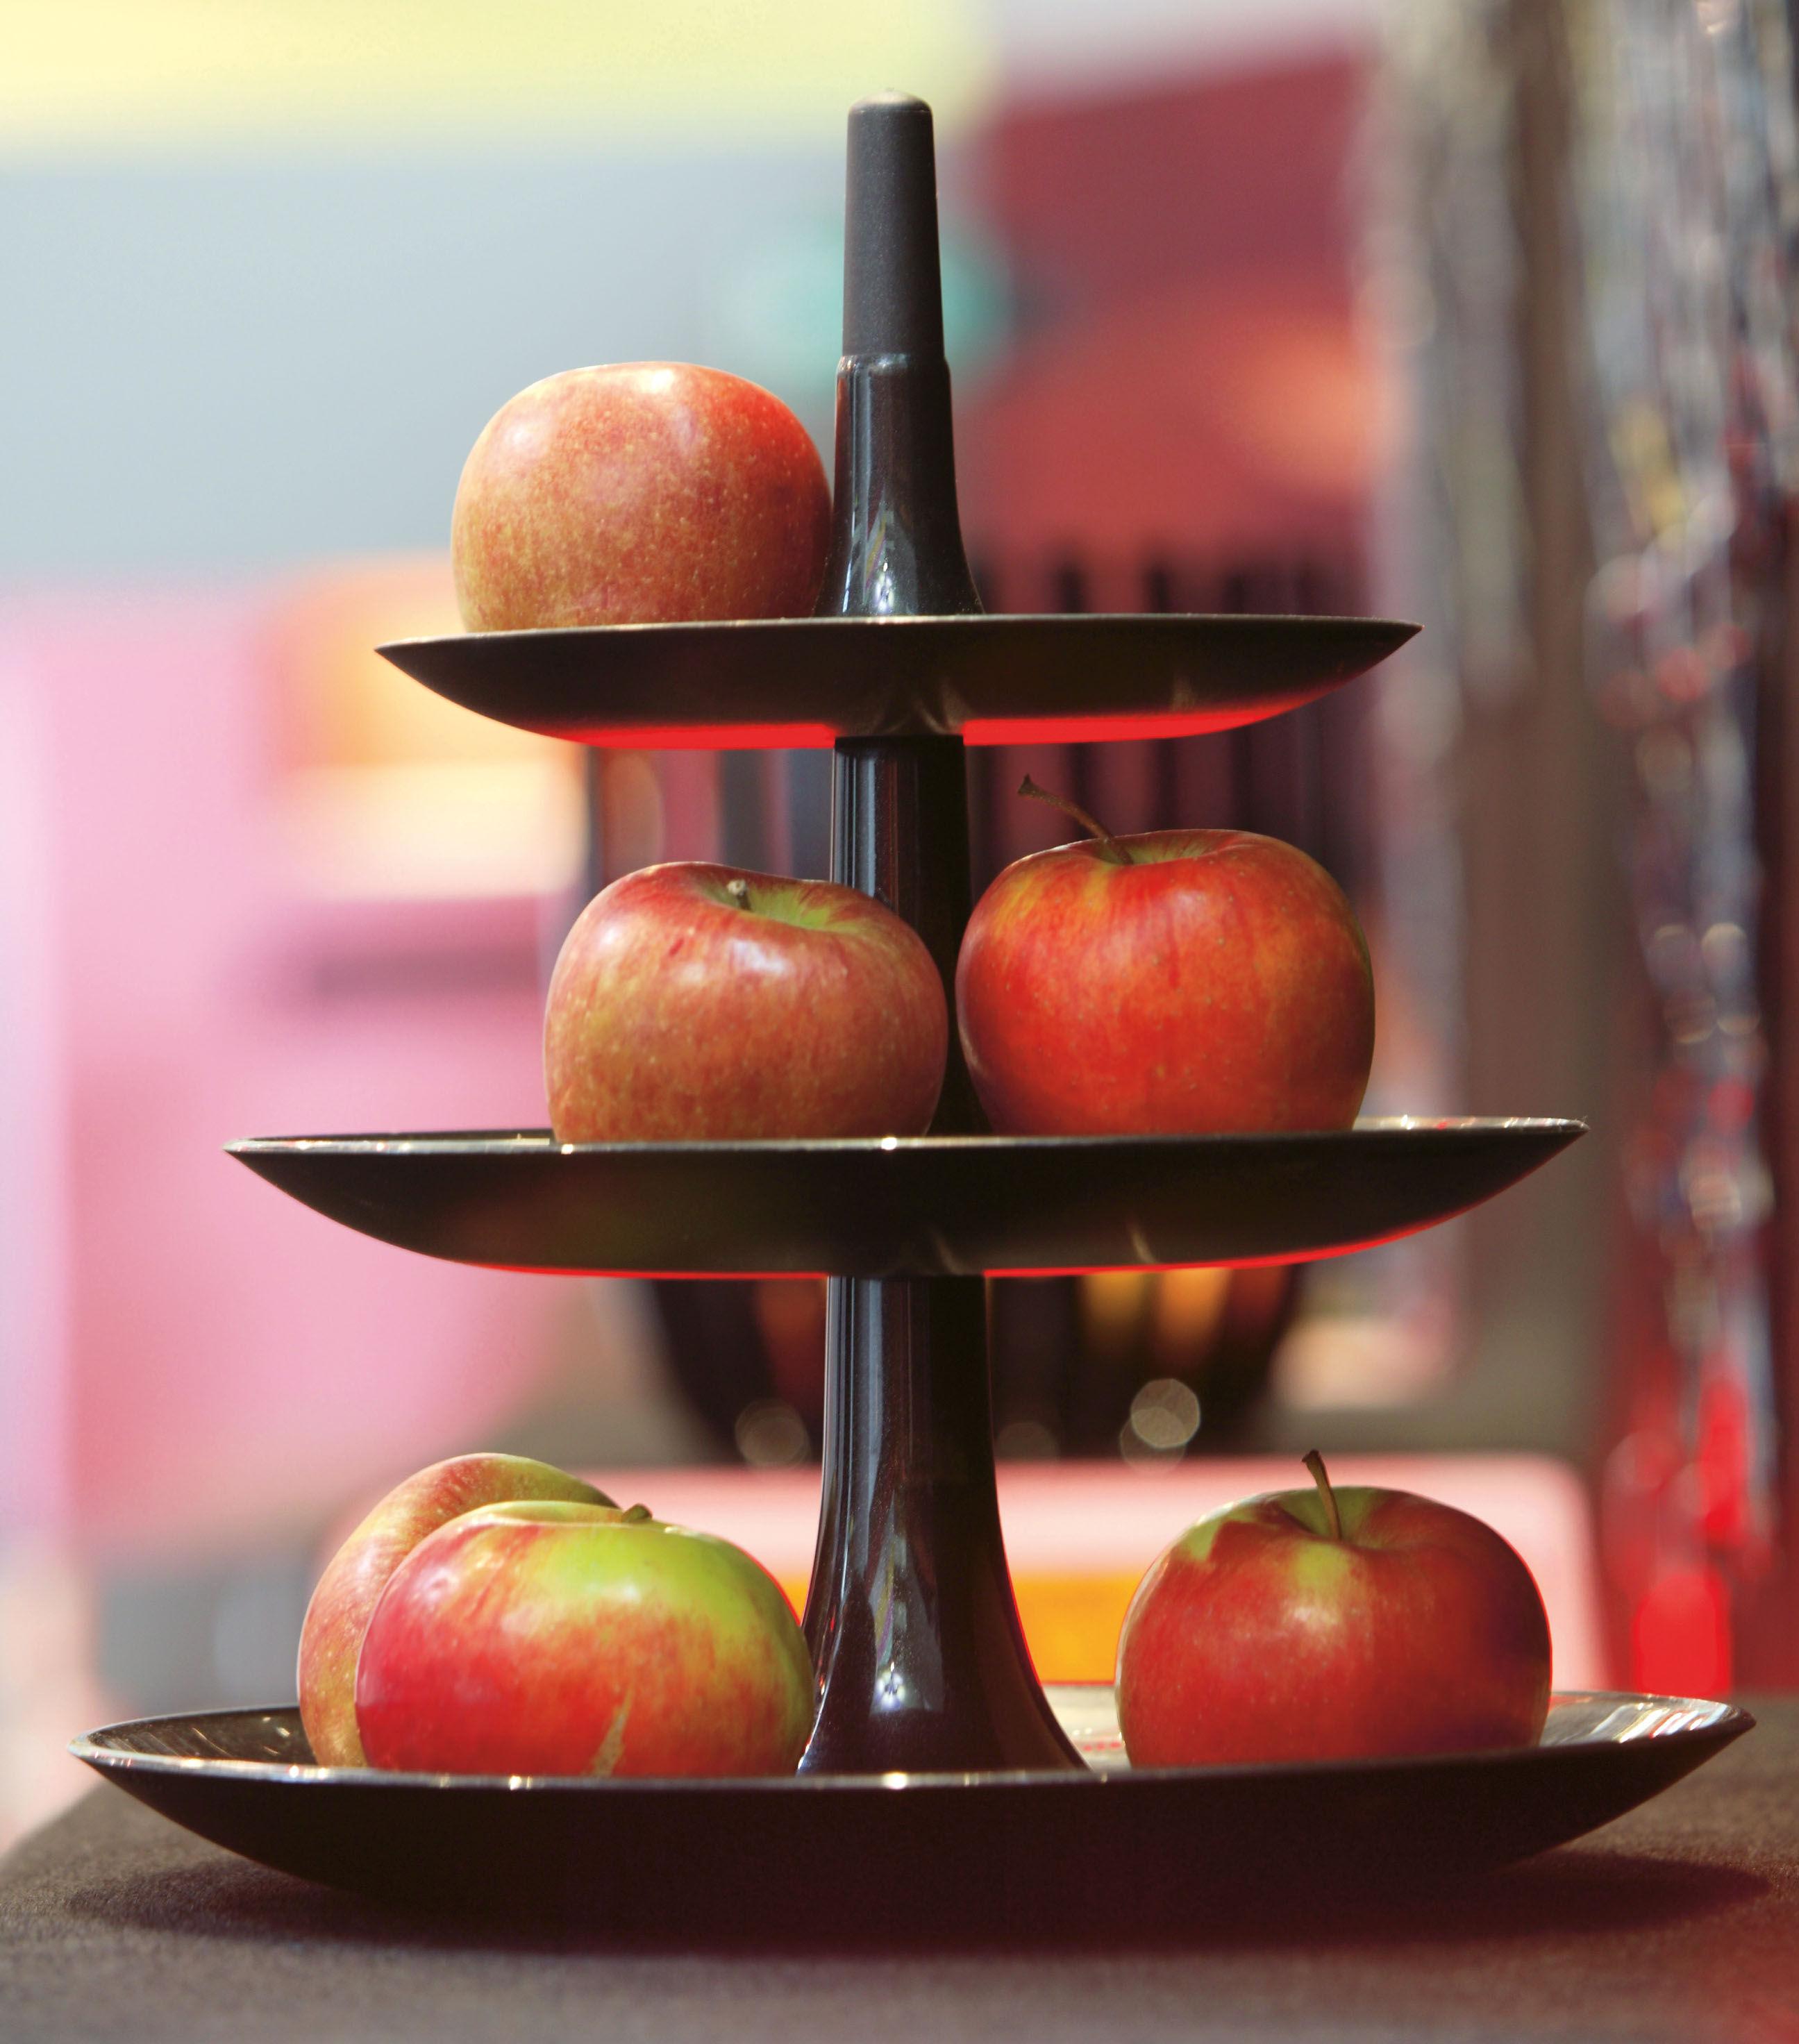 Serviteur babell 31 4 x h 34 cm noir opaque koziol made in design - Corbeille a fruits 3 etages ...